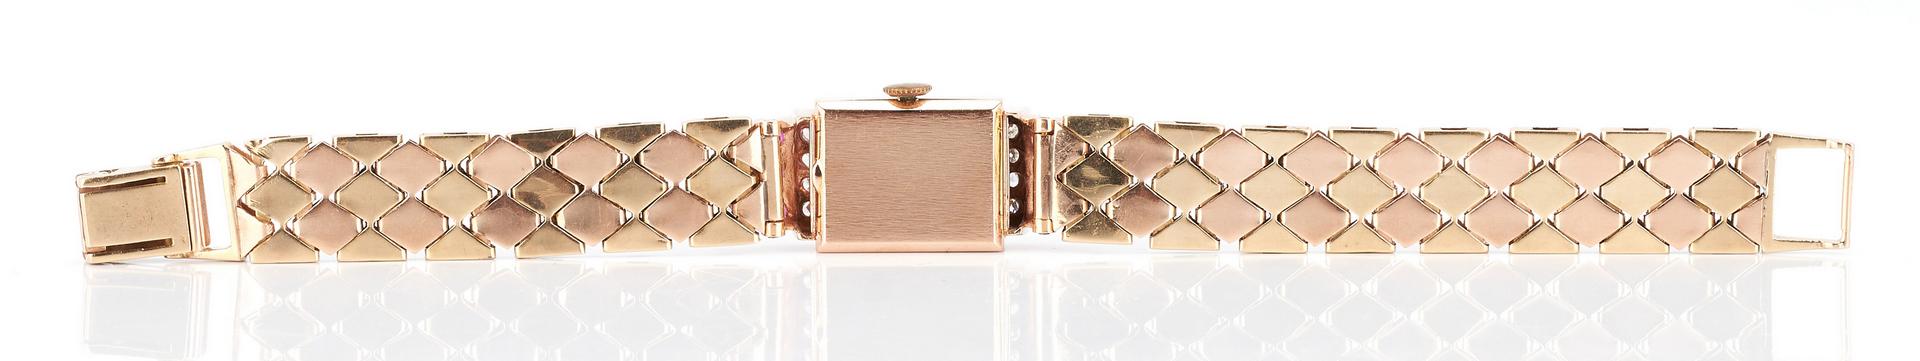 Lot 500: Ladies Tourneau 14K Gold, Ruby, and Diamond Watch